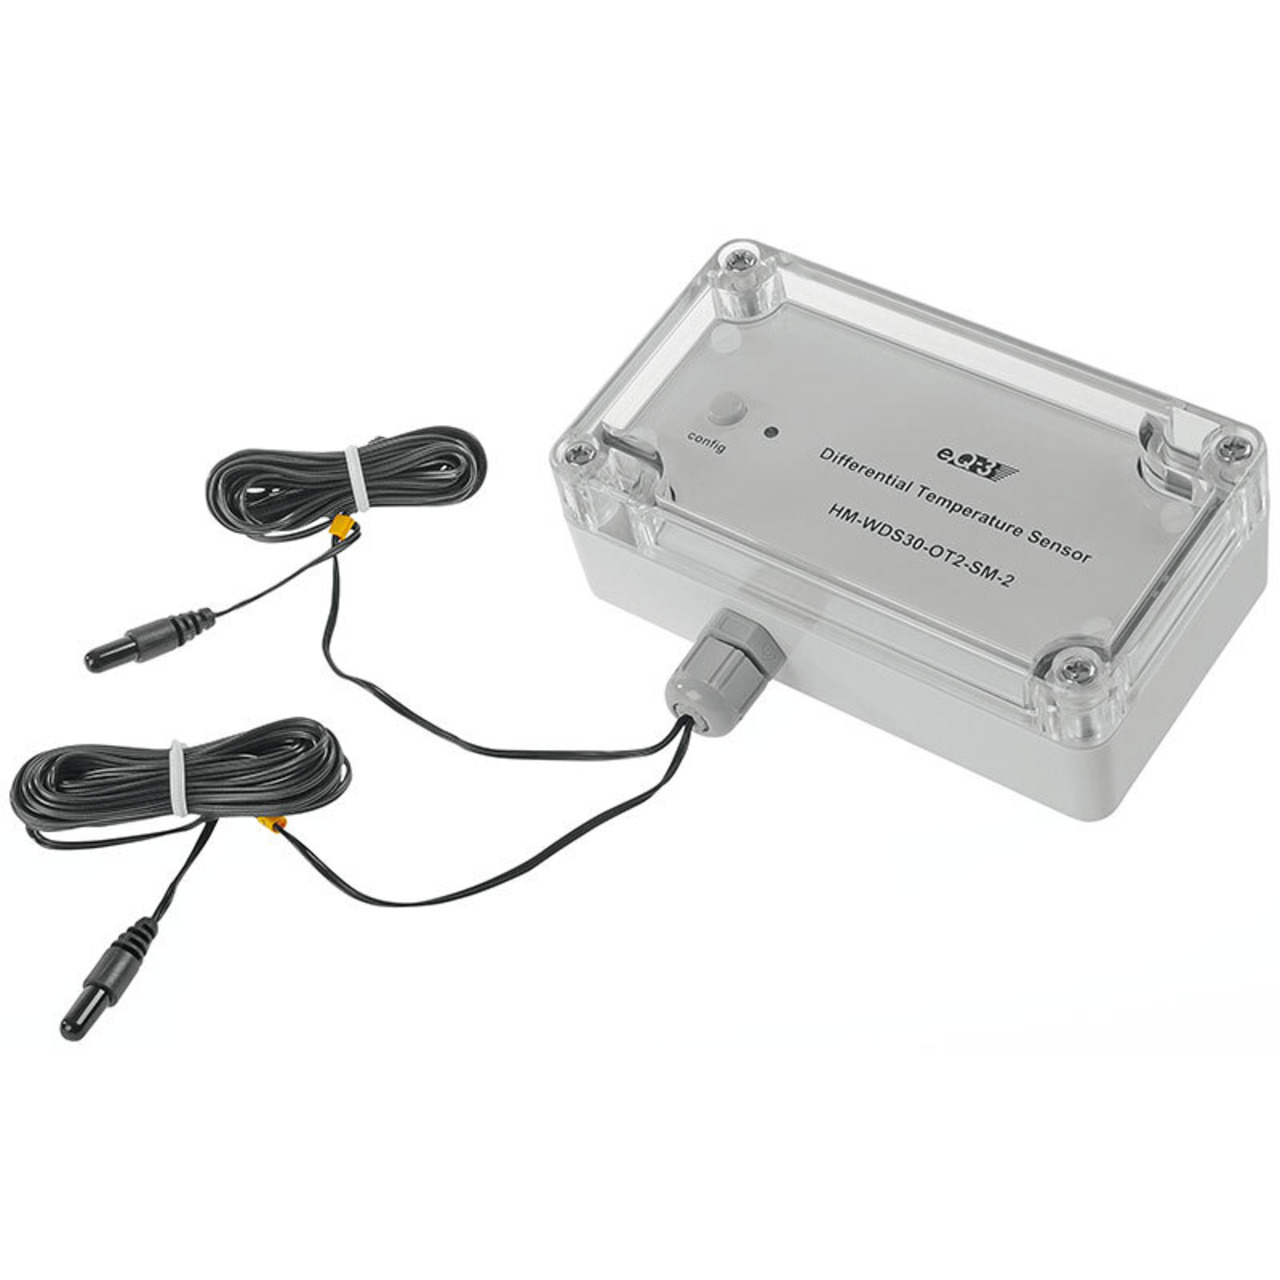 Homematic Differenz-Temperatur-Sensor HM-WDS30-OT2-SM-2 für Smart Home / Hausautomation